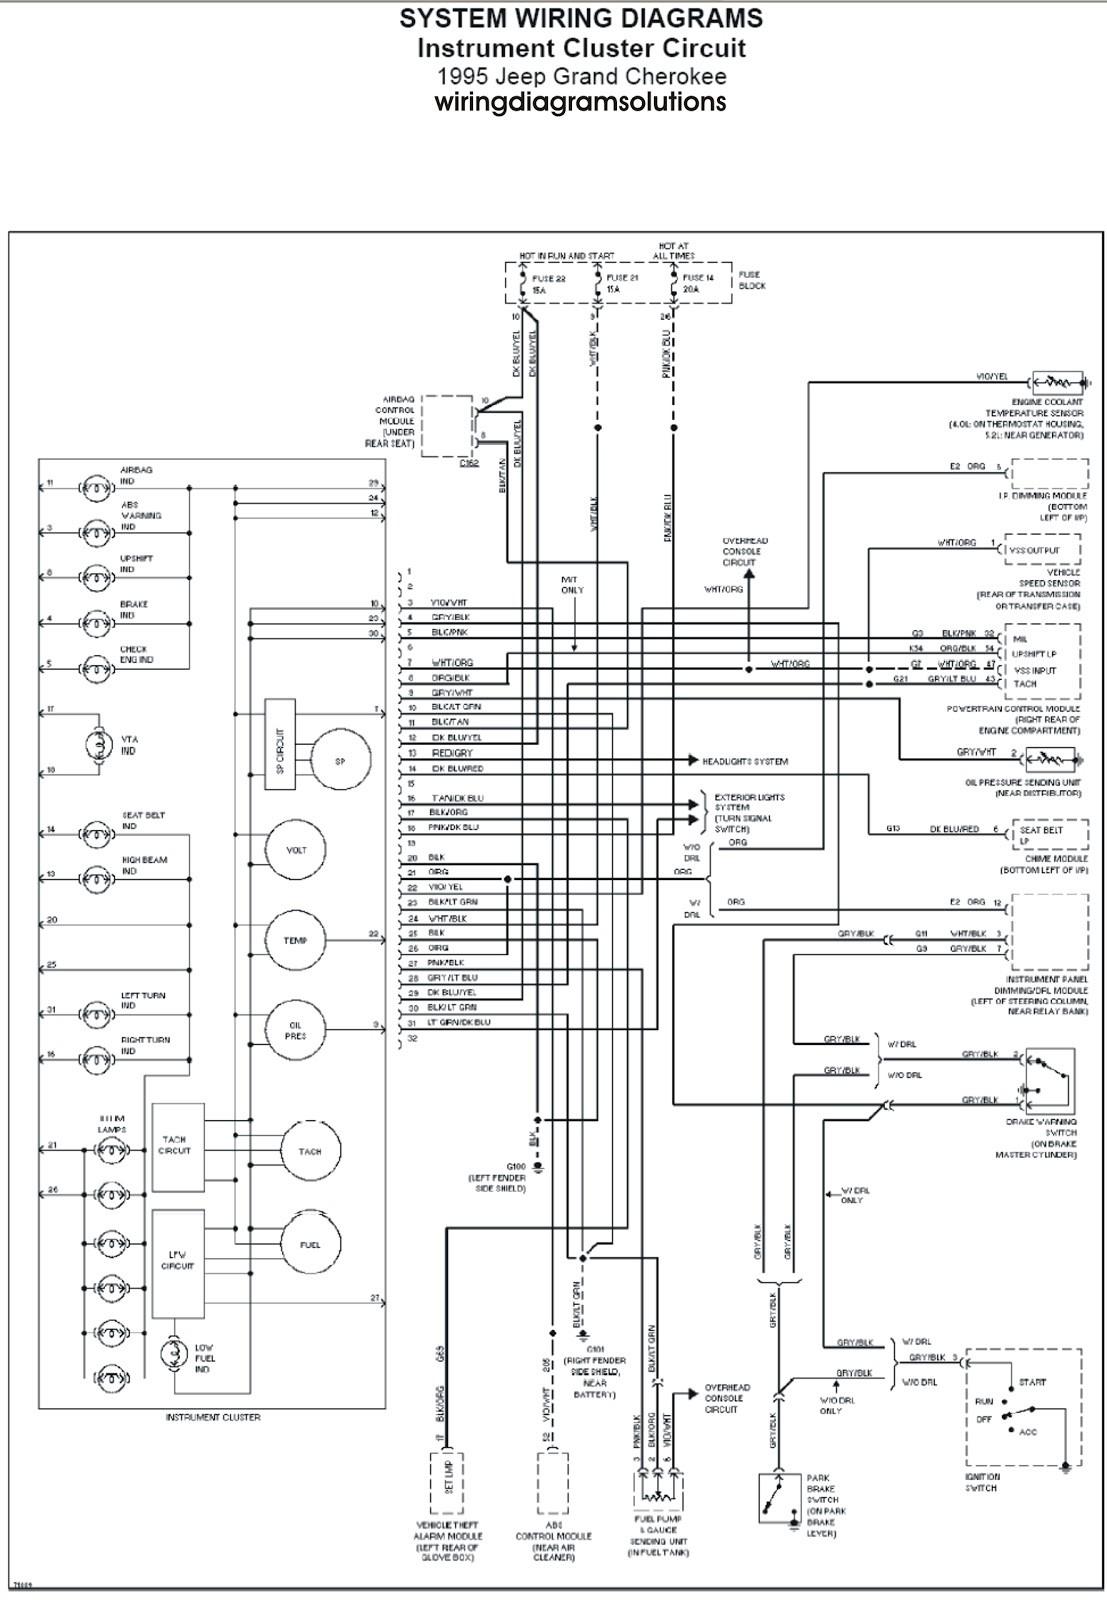 2000 jeep grand cherokee infinity radio wiring diagram running track 1999 stereo